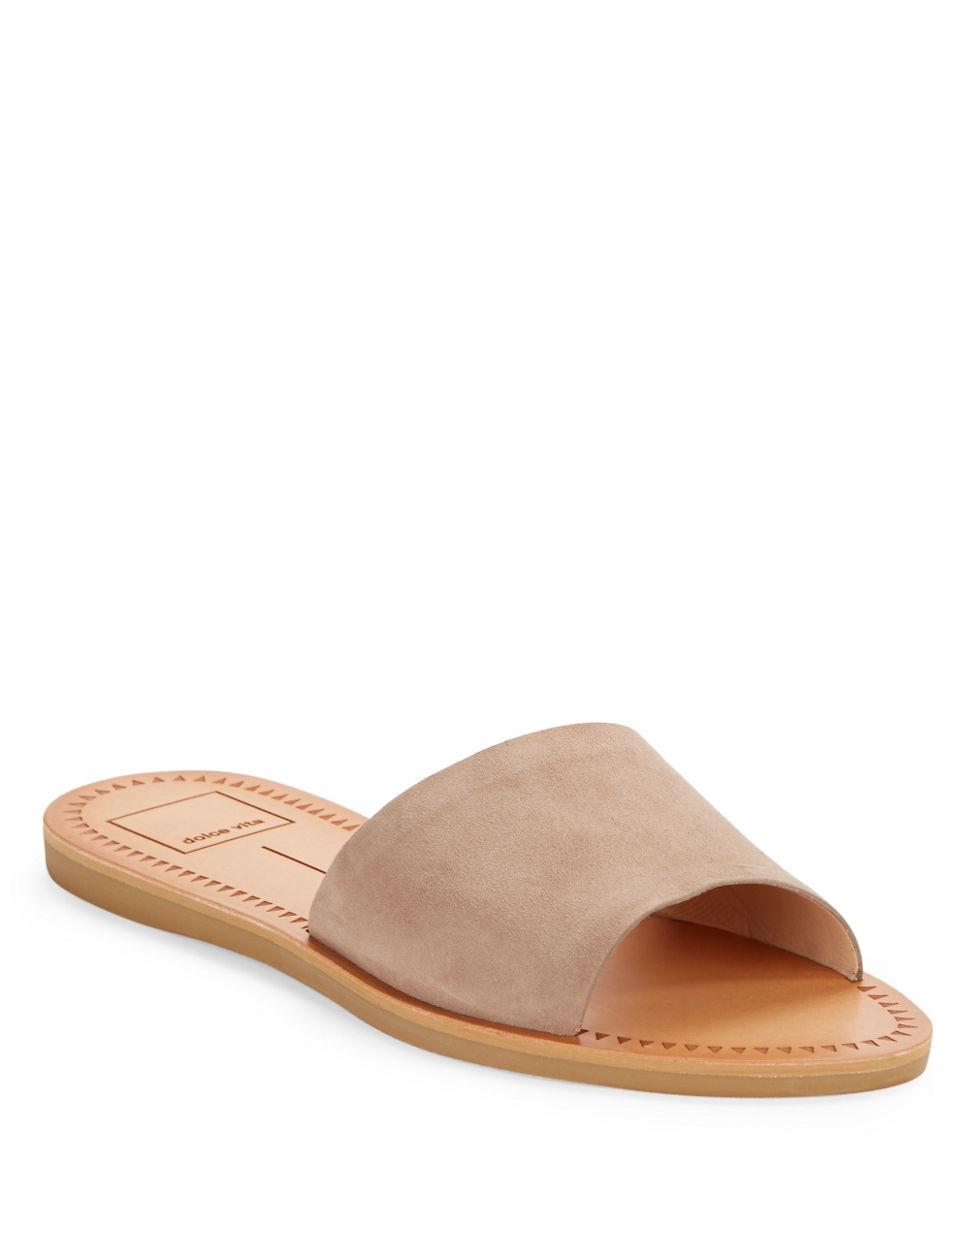 dolce vita slip on sandals hot 2142d 9b526